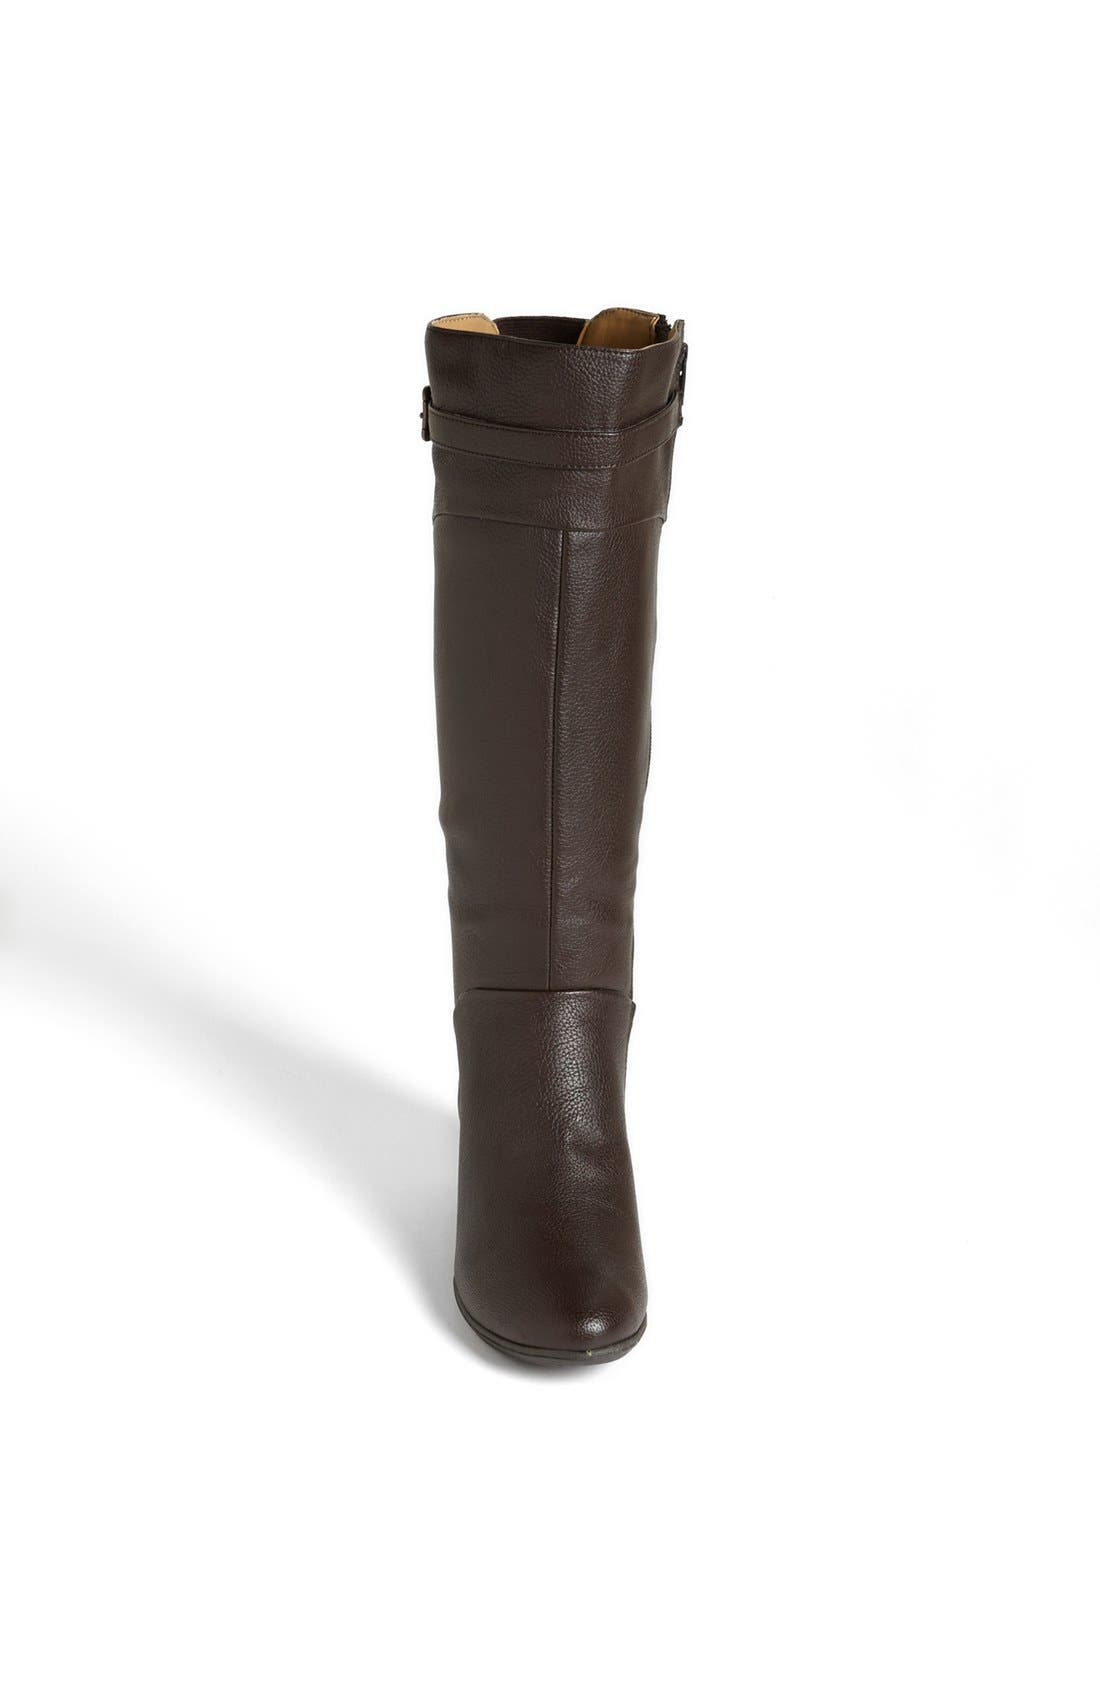 Alternate Image 3  - Softspots 'Oliva' Boot